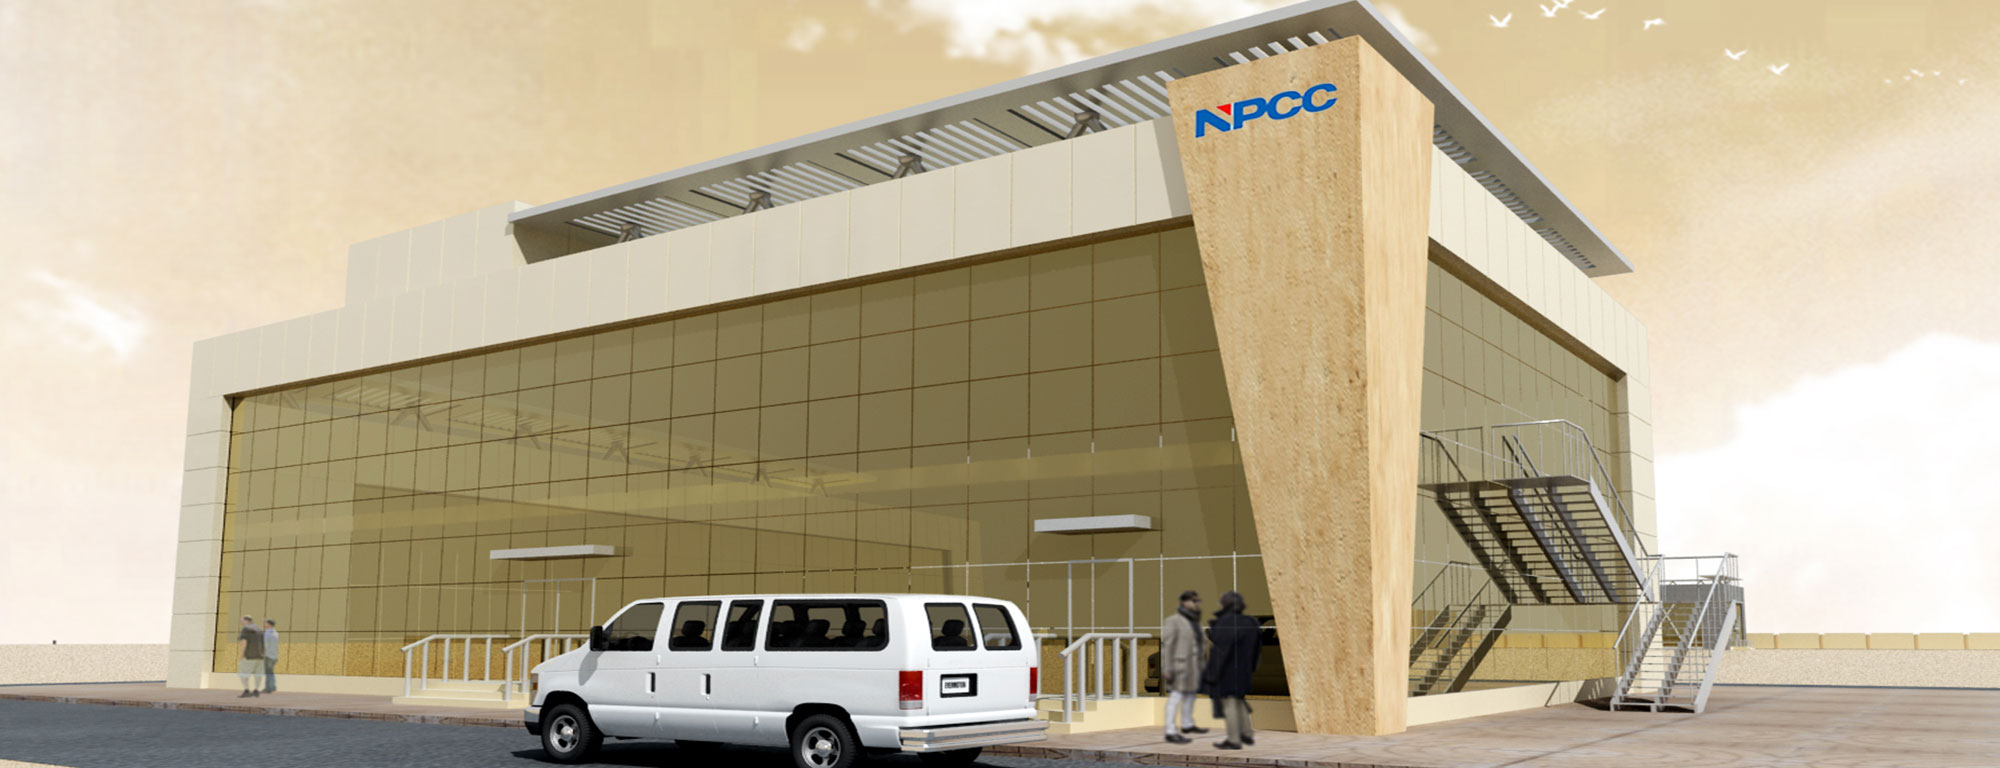 NPCC Fabrication Building – Bainona Engineering Consultancy